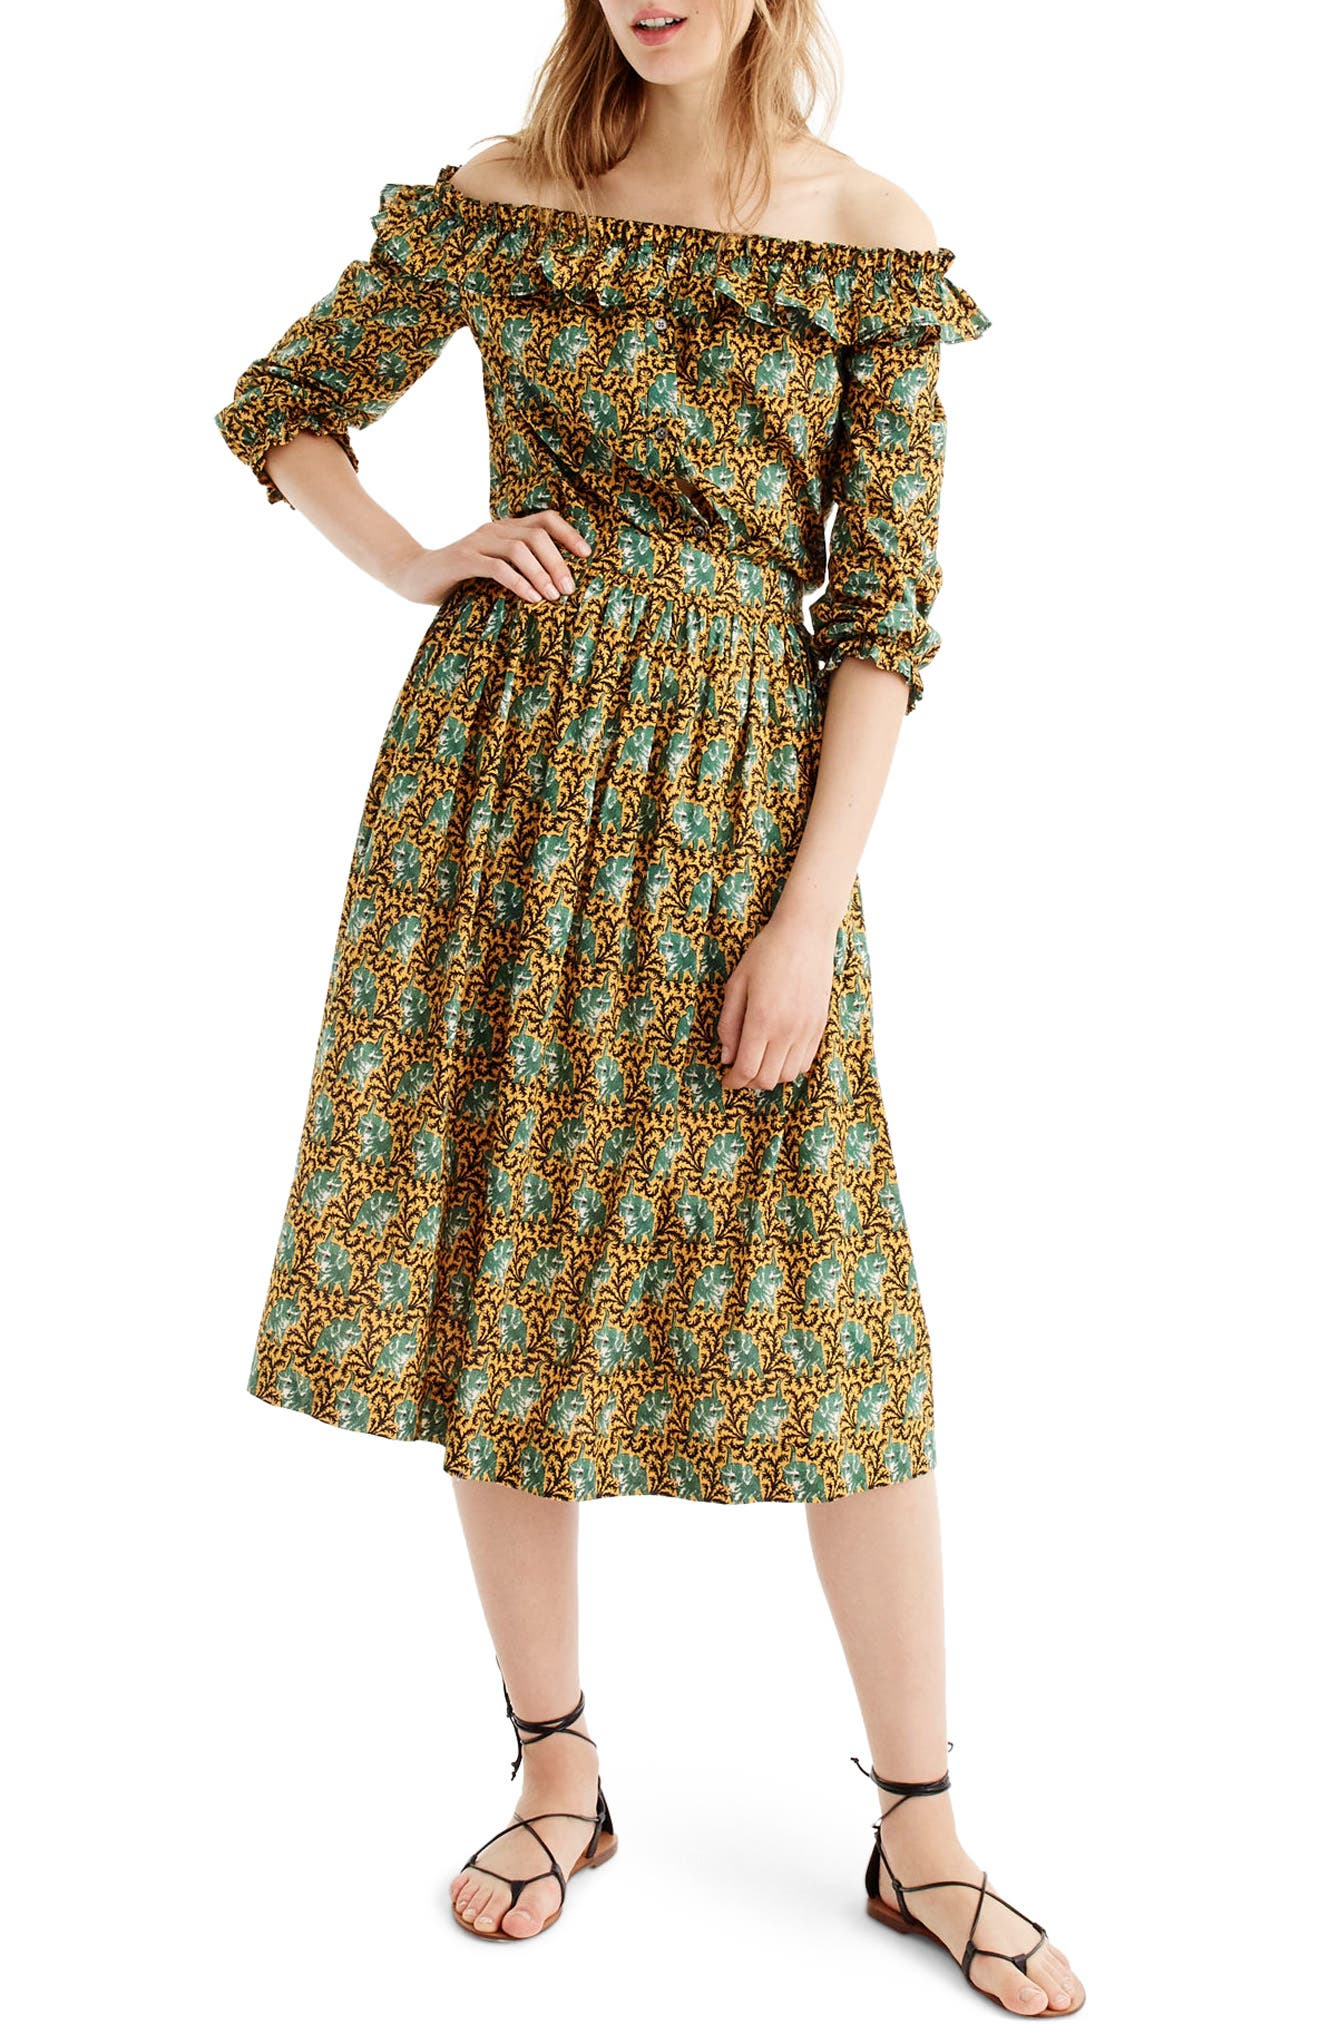 Elephant Print Skirt,                         Main,                         color, 209